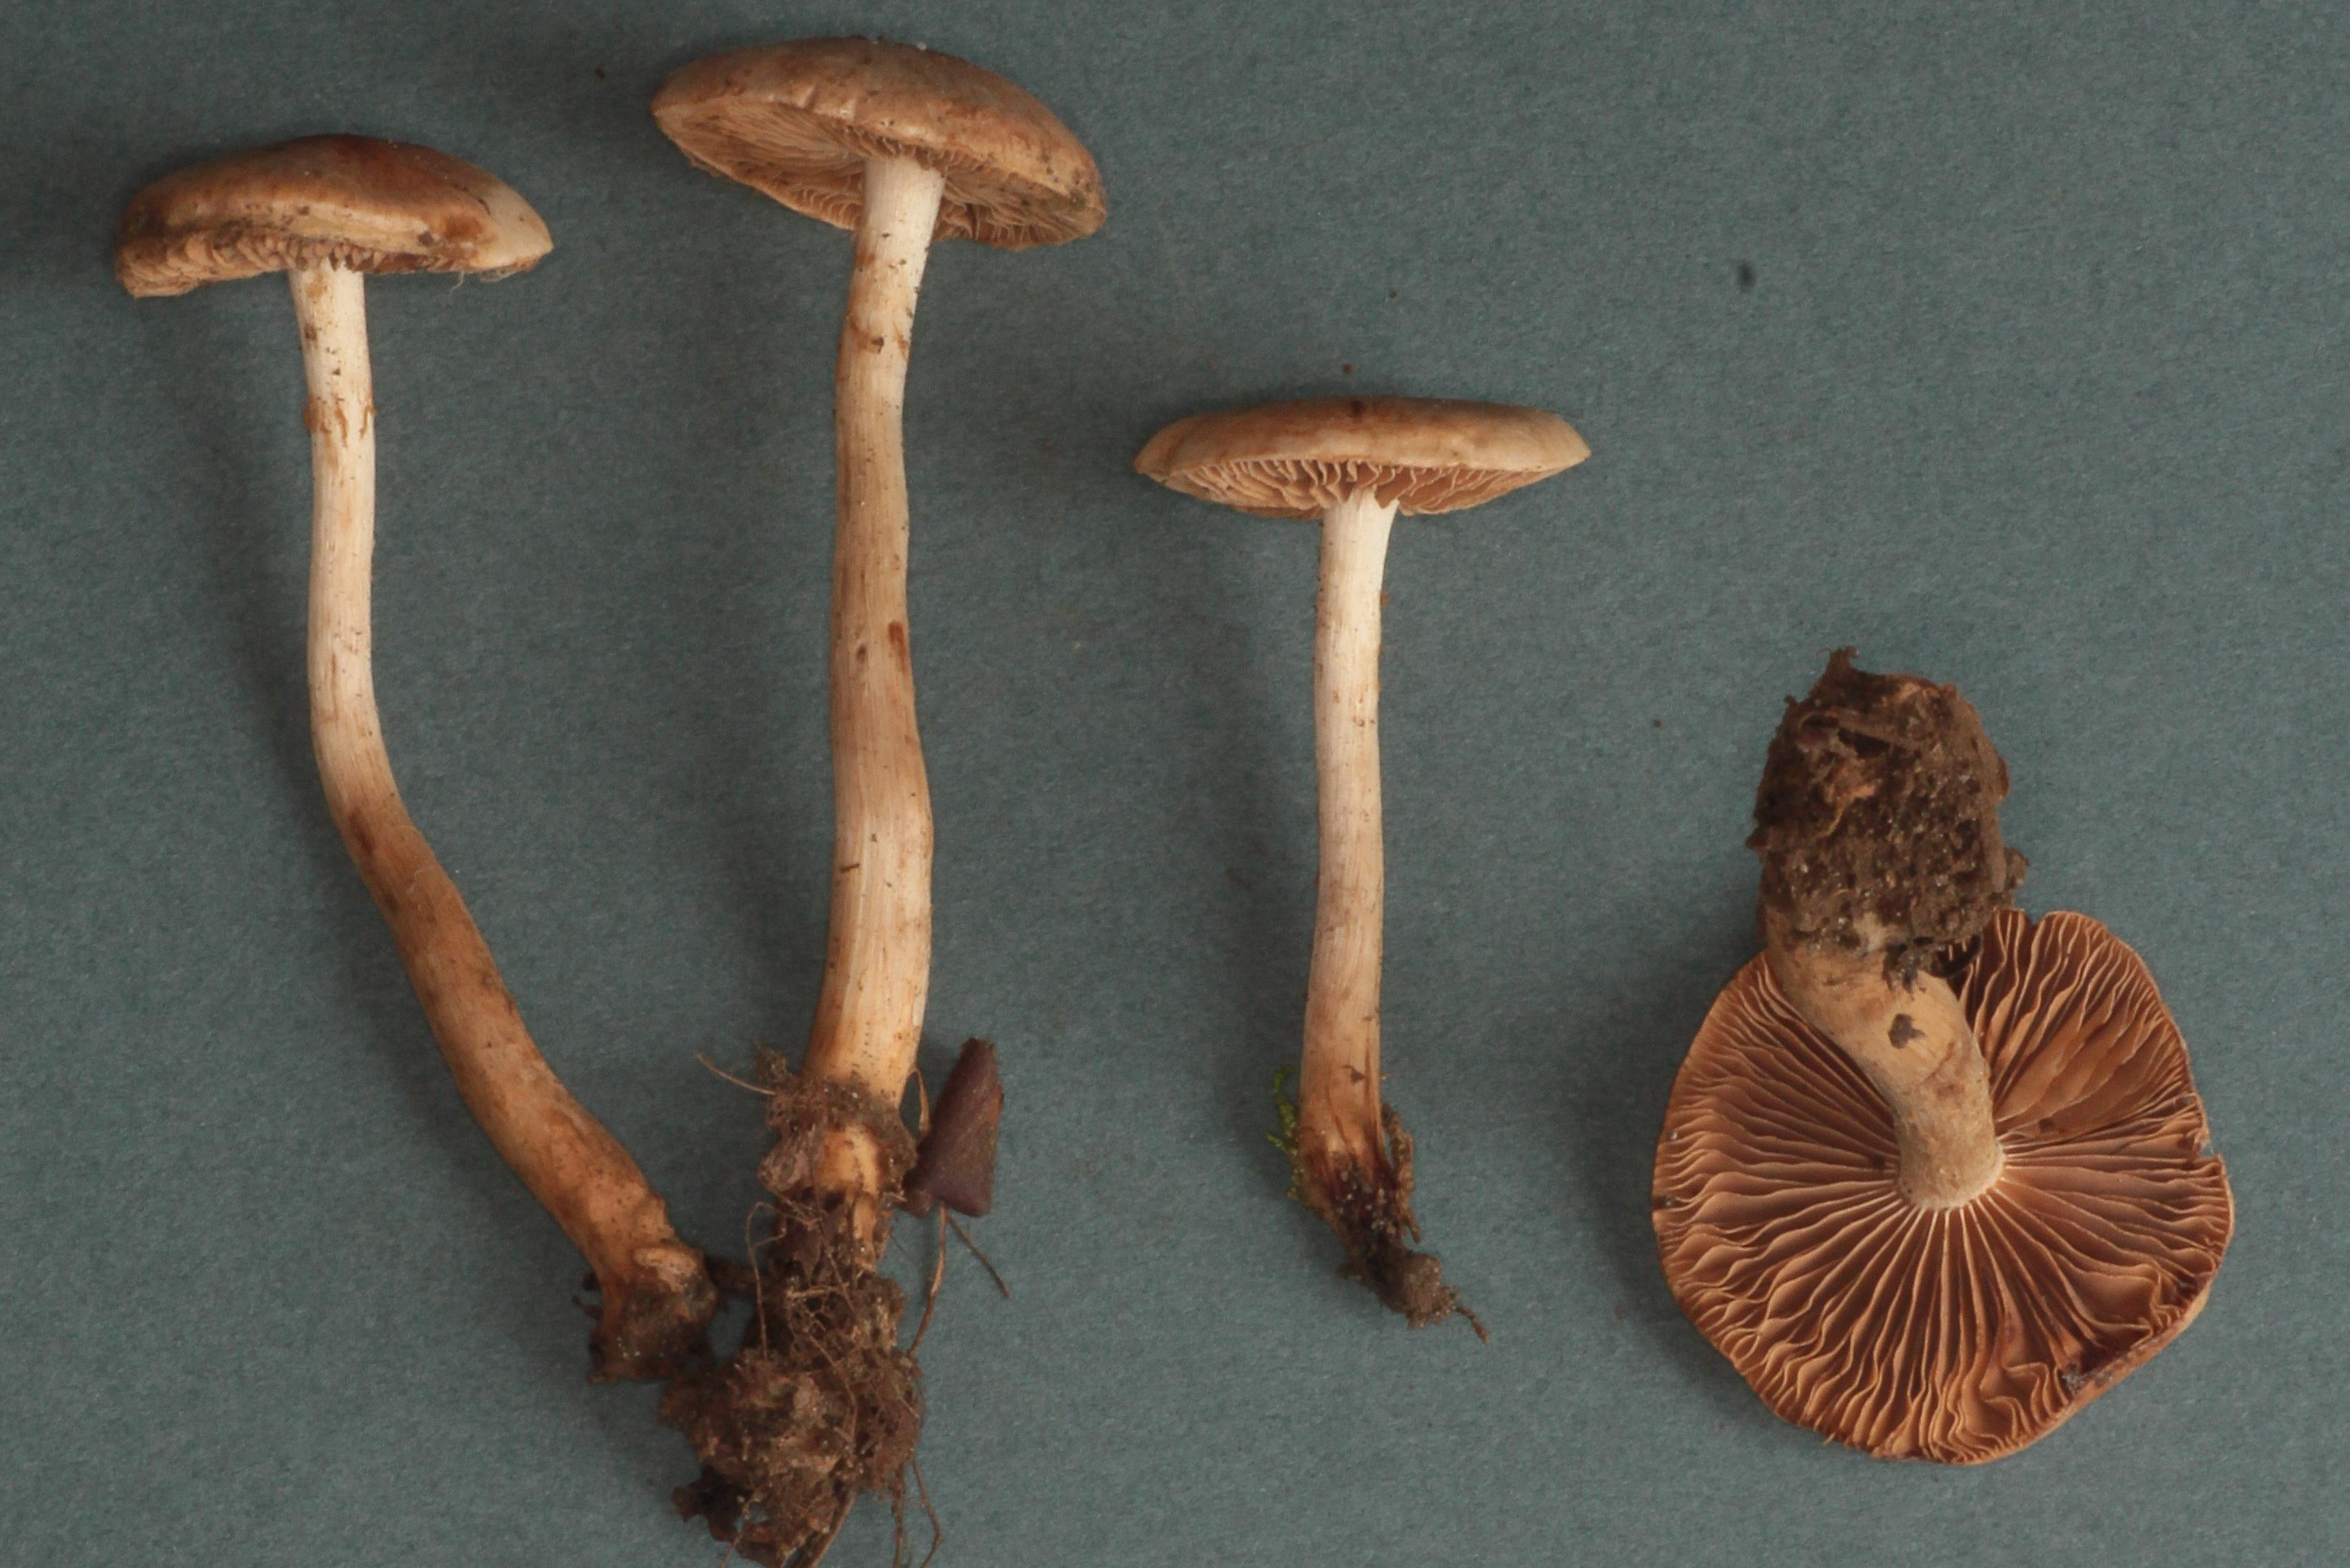 Hebeloma candidipes image